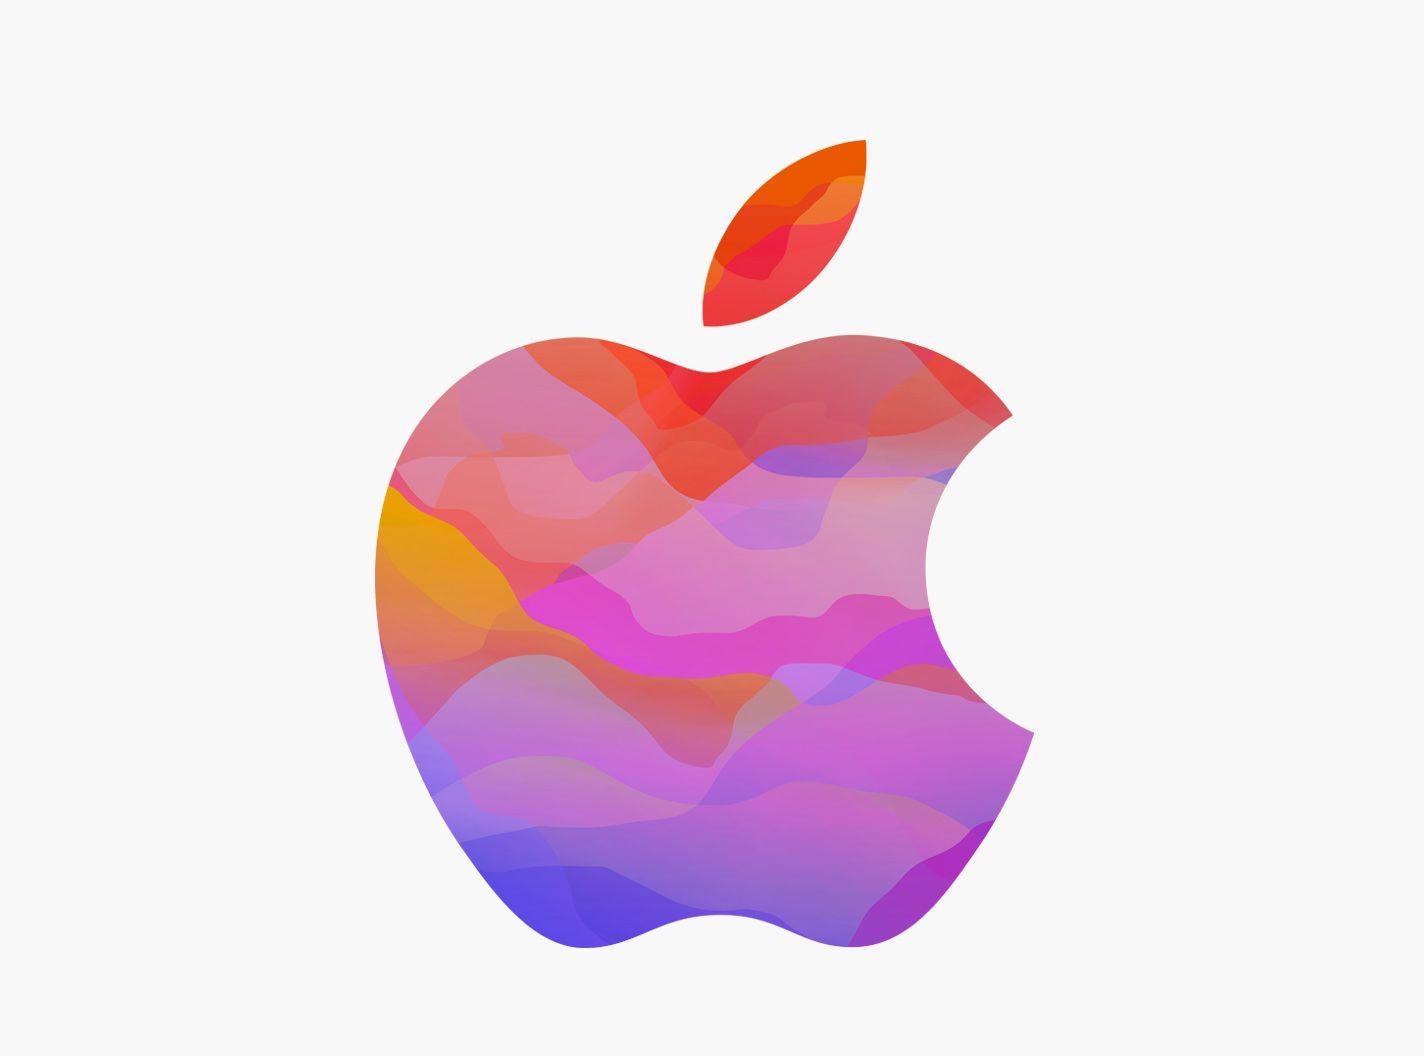 All Of The Apple Logos From The October 30th Event Invites Imgur Apple Logo Apple Logo Wallpaper Iphone Apple Logo Wallpaper